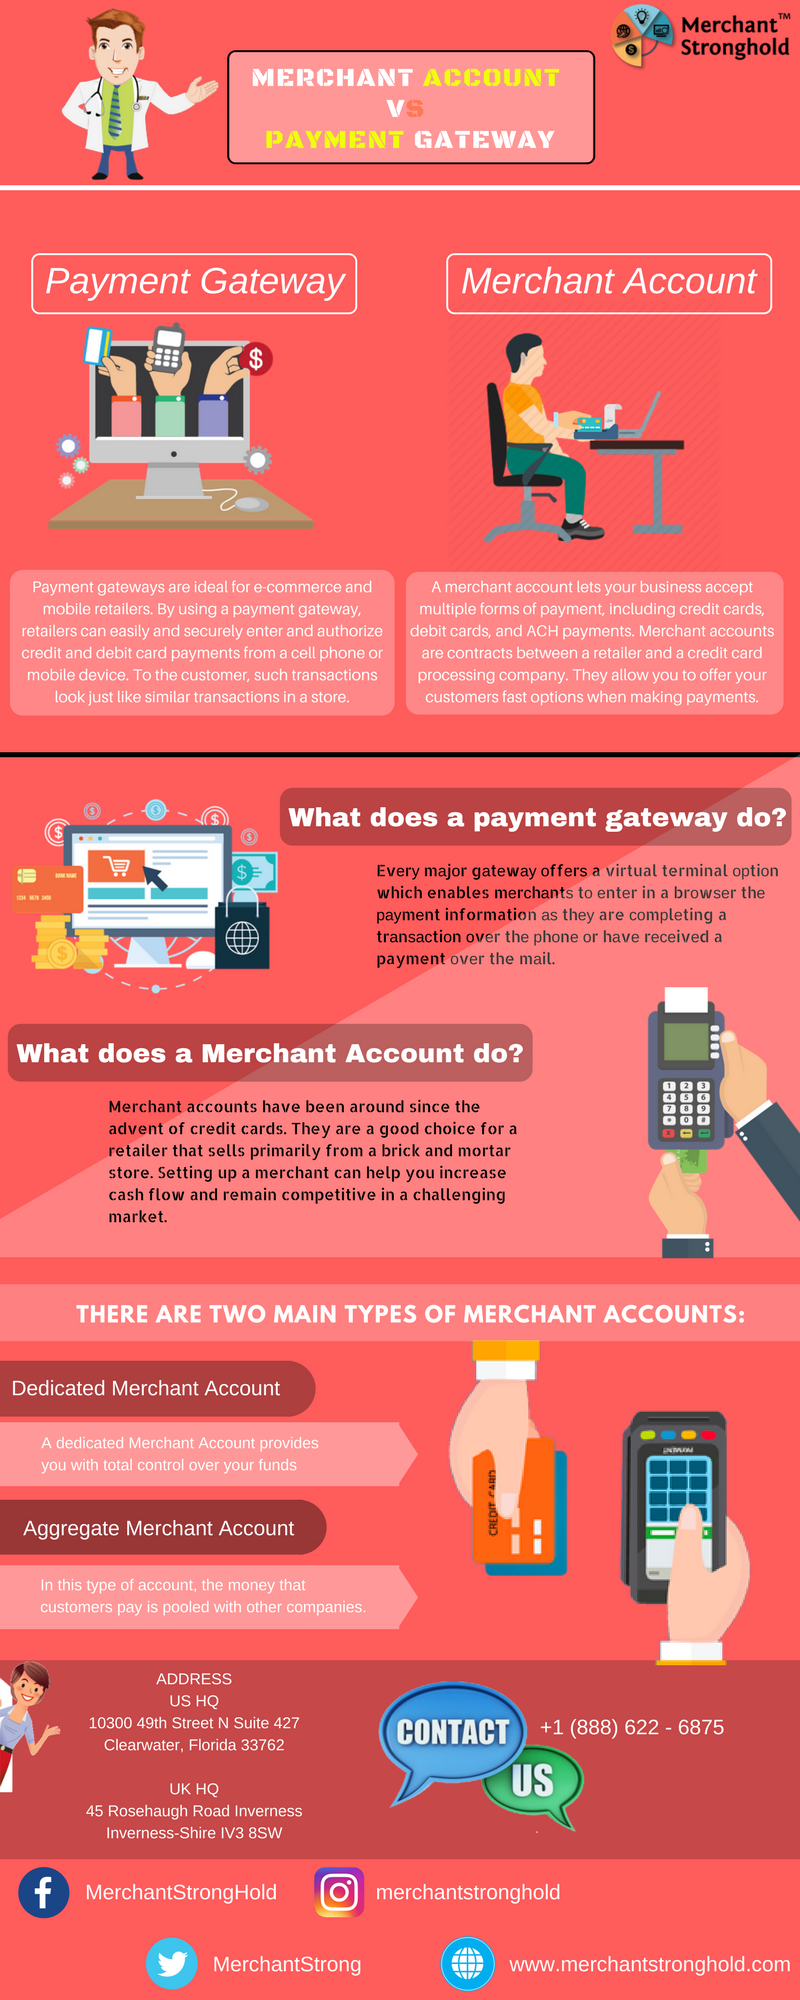 Payment Gateway Payment gateway, Merchant account, Payment